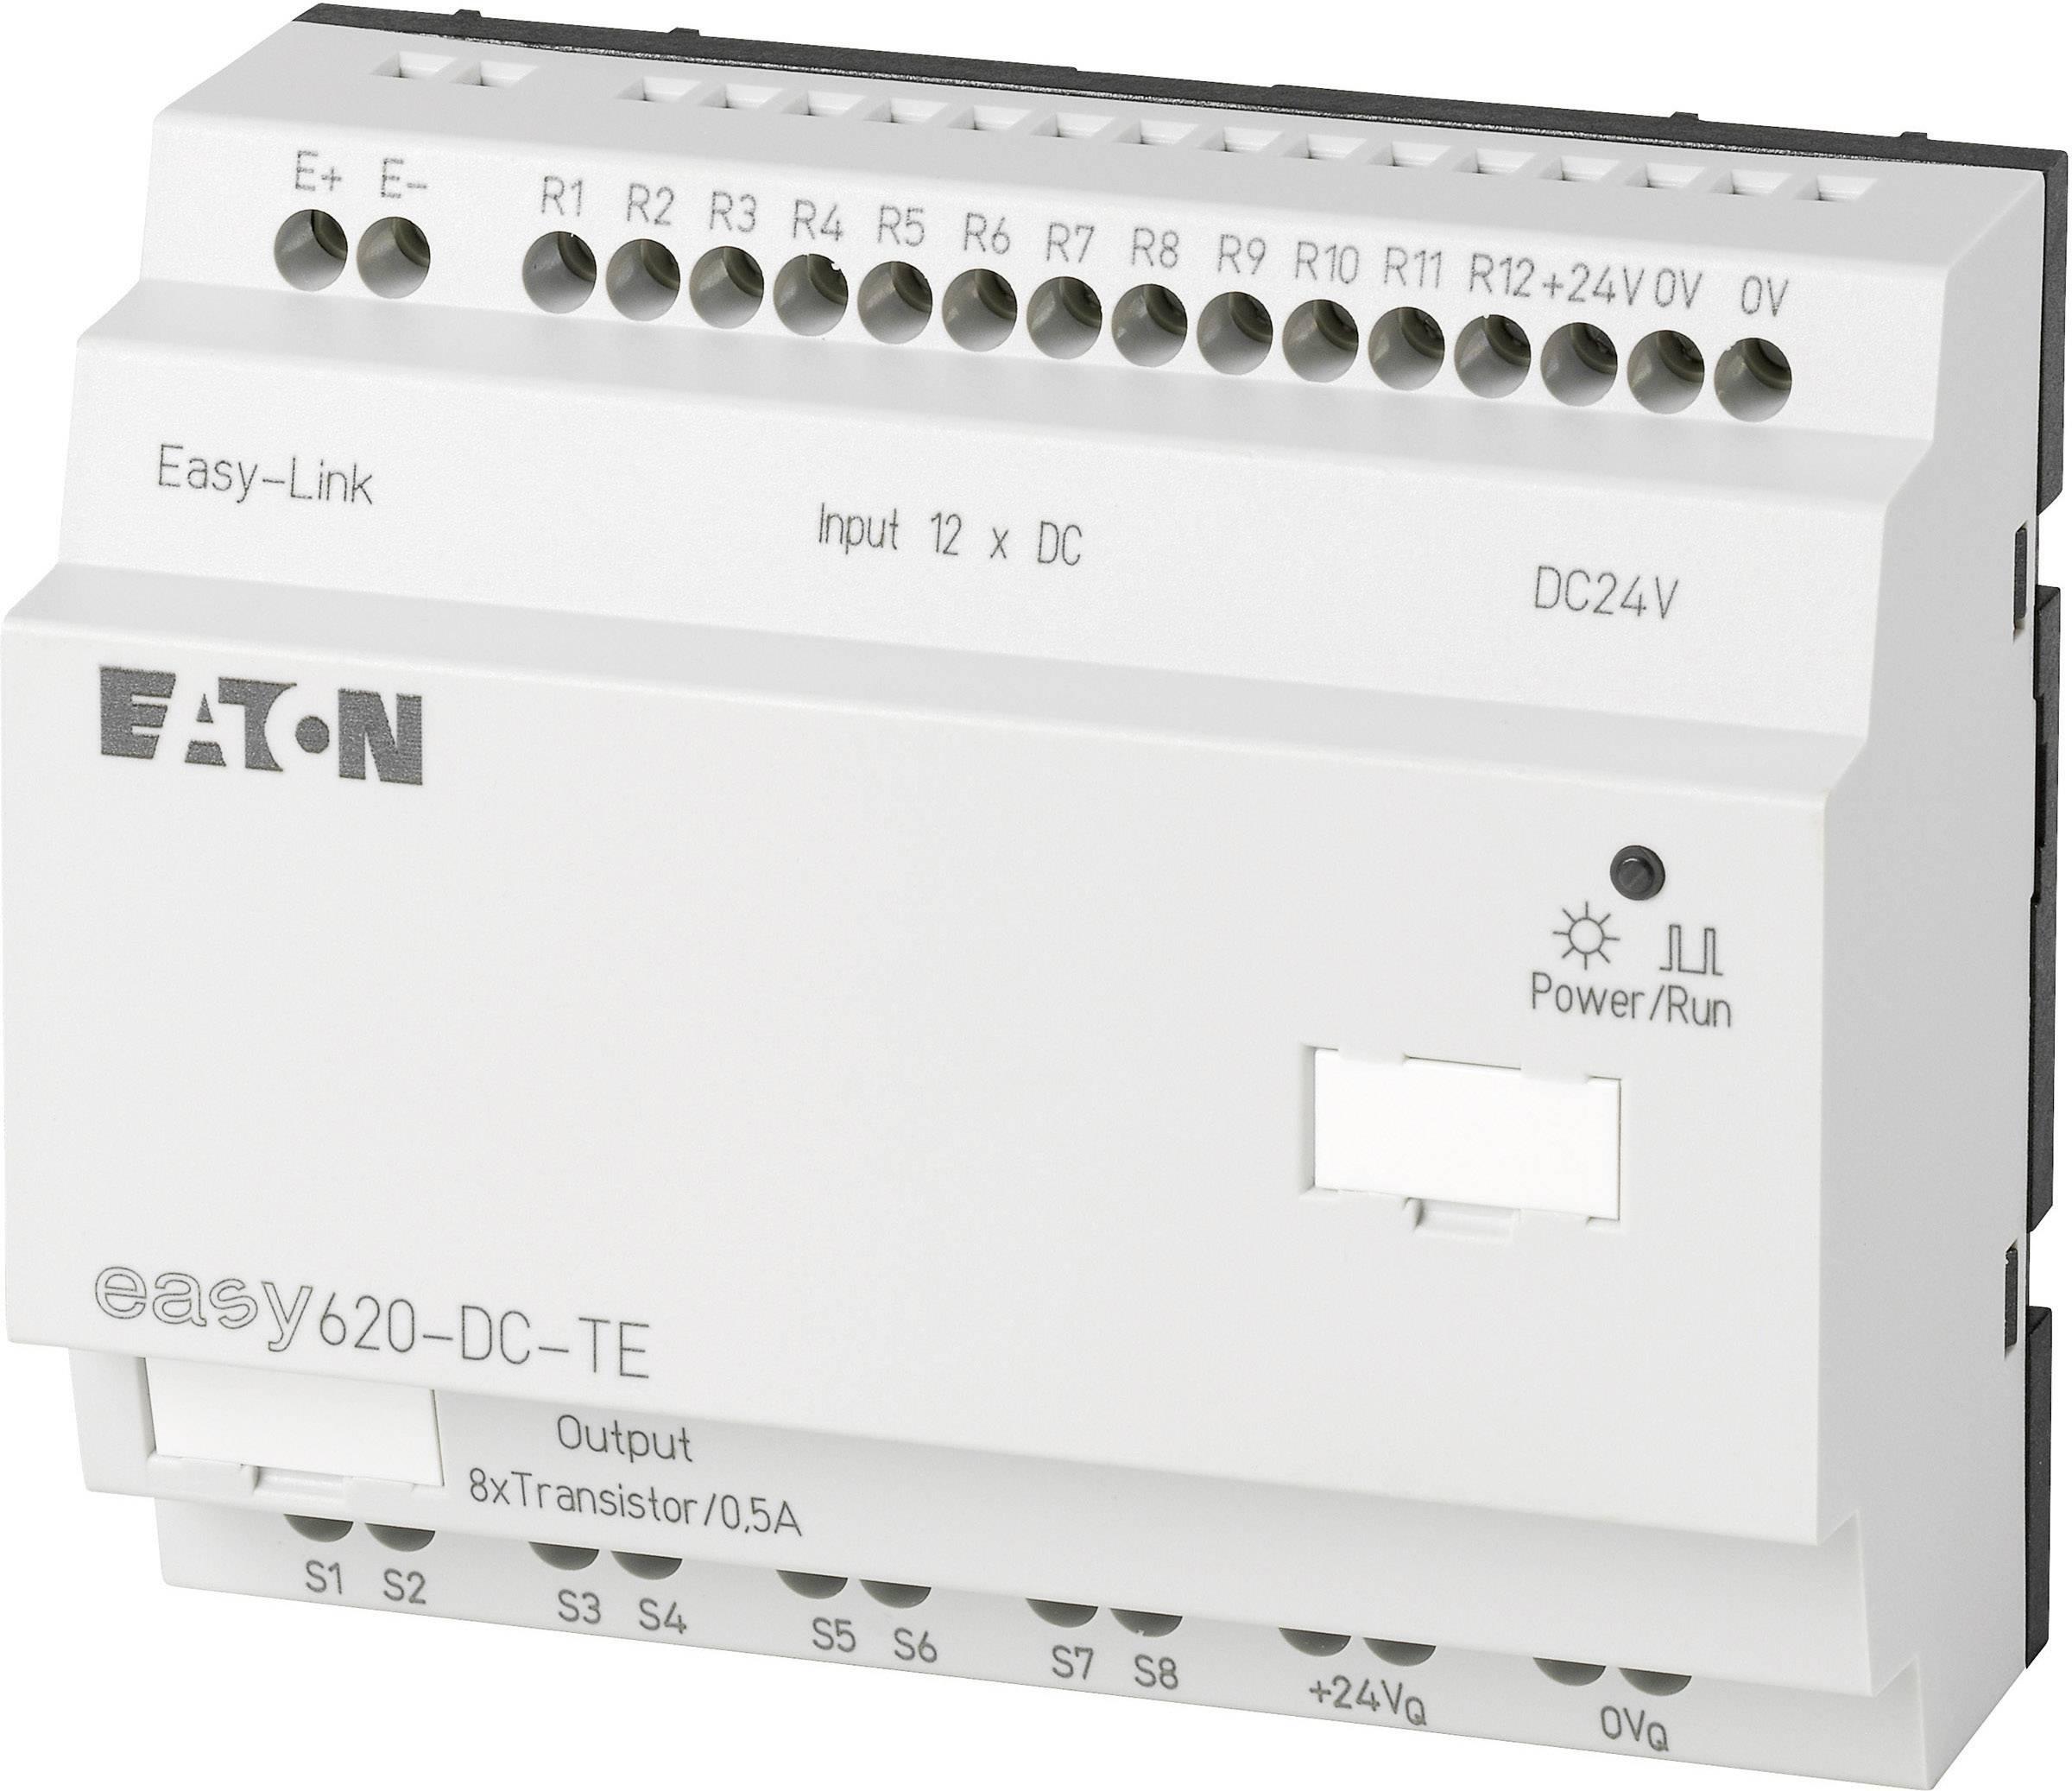 Riadiacimodul Eaton easy 620-DC-TE 212313, 24 V/DC